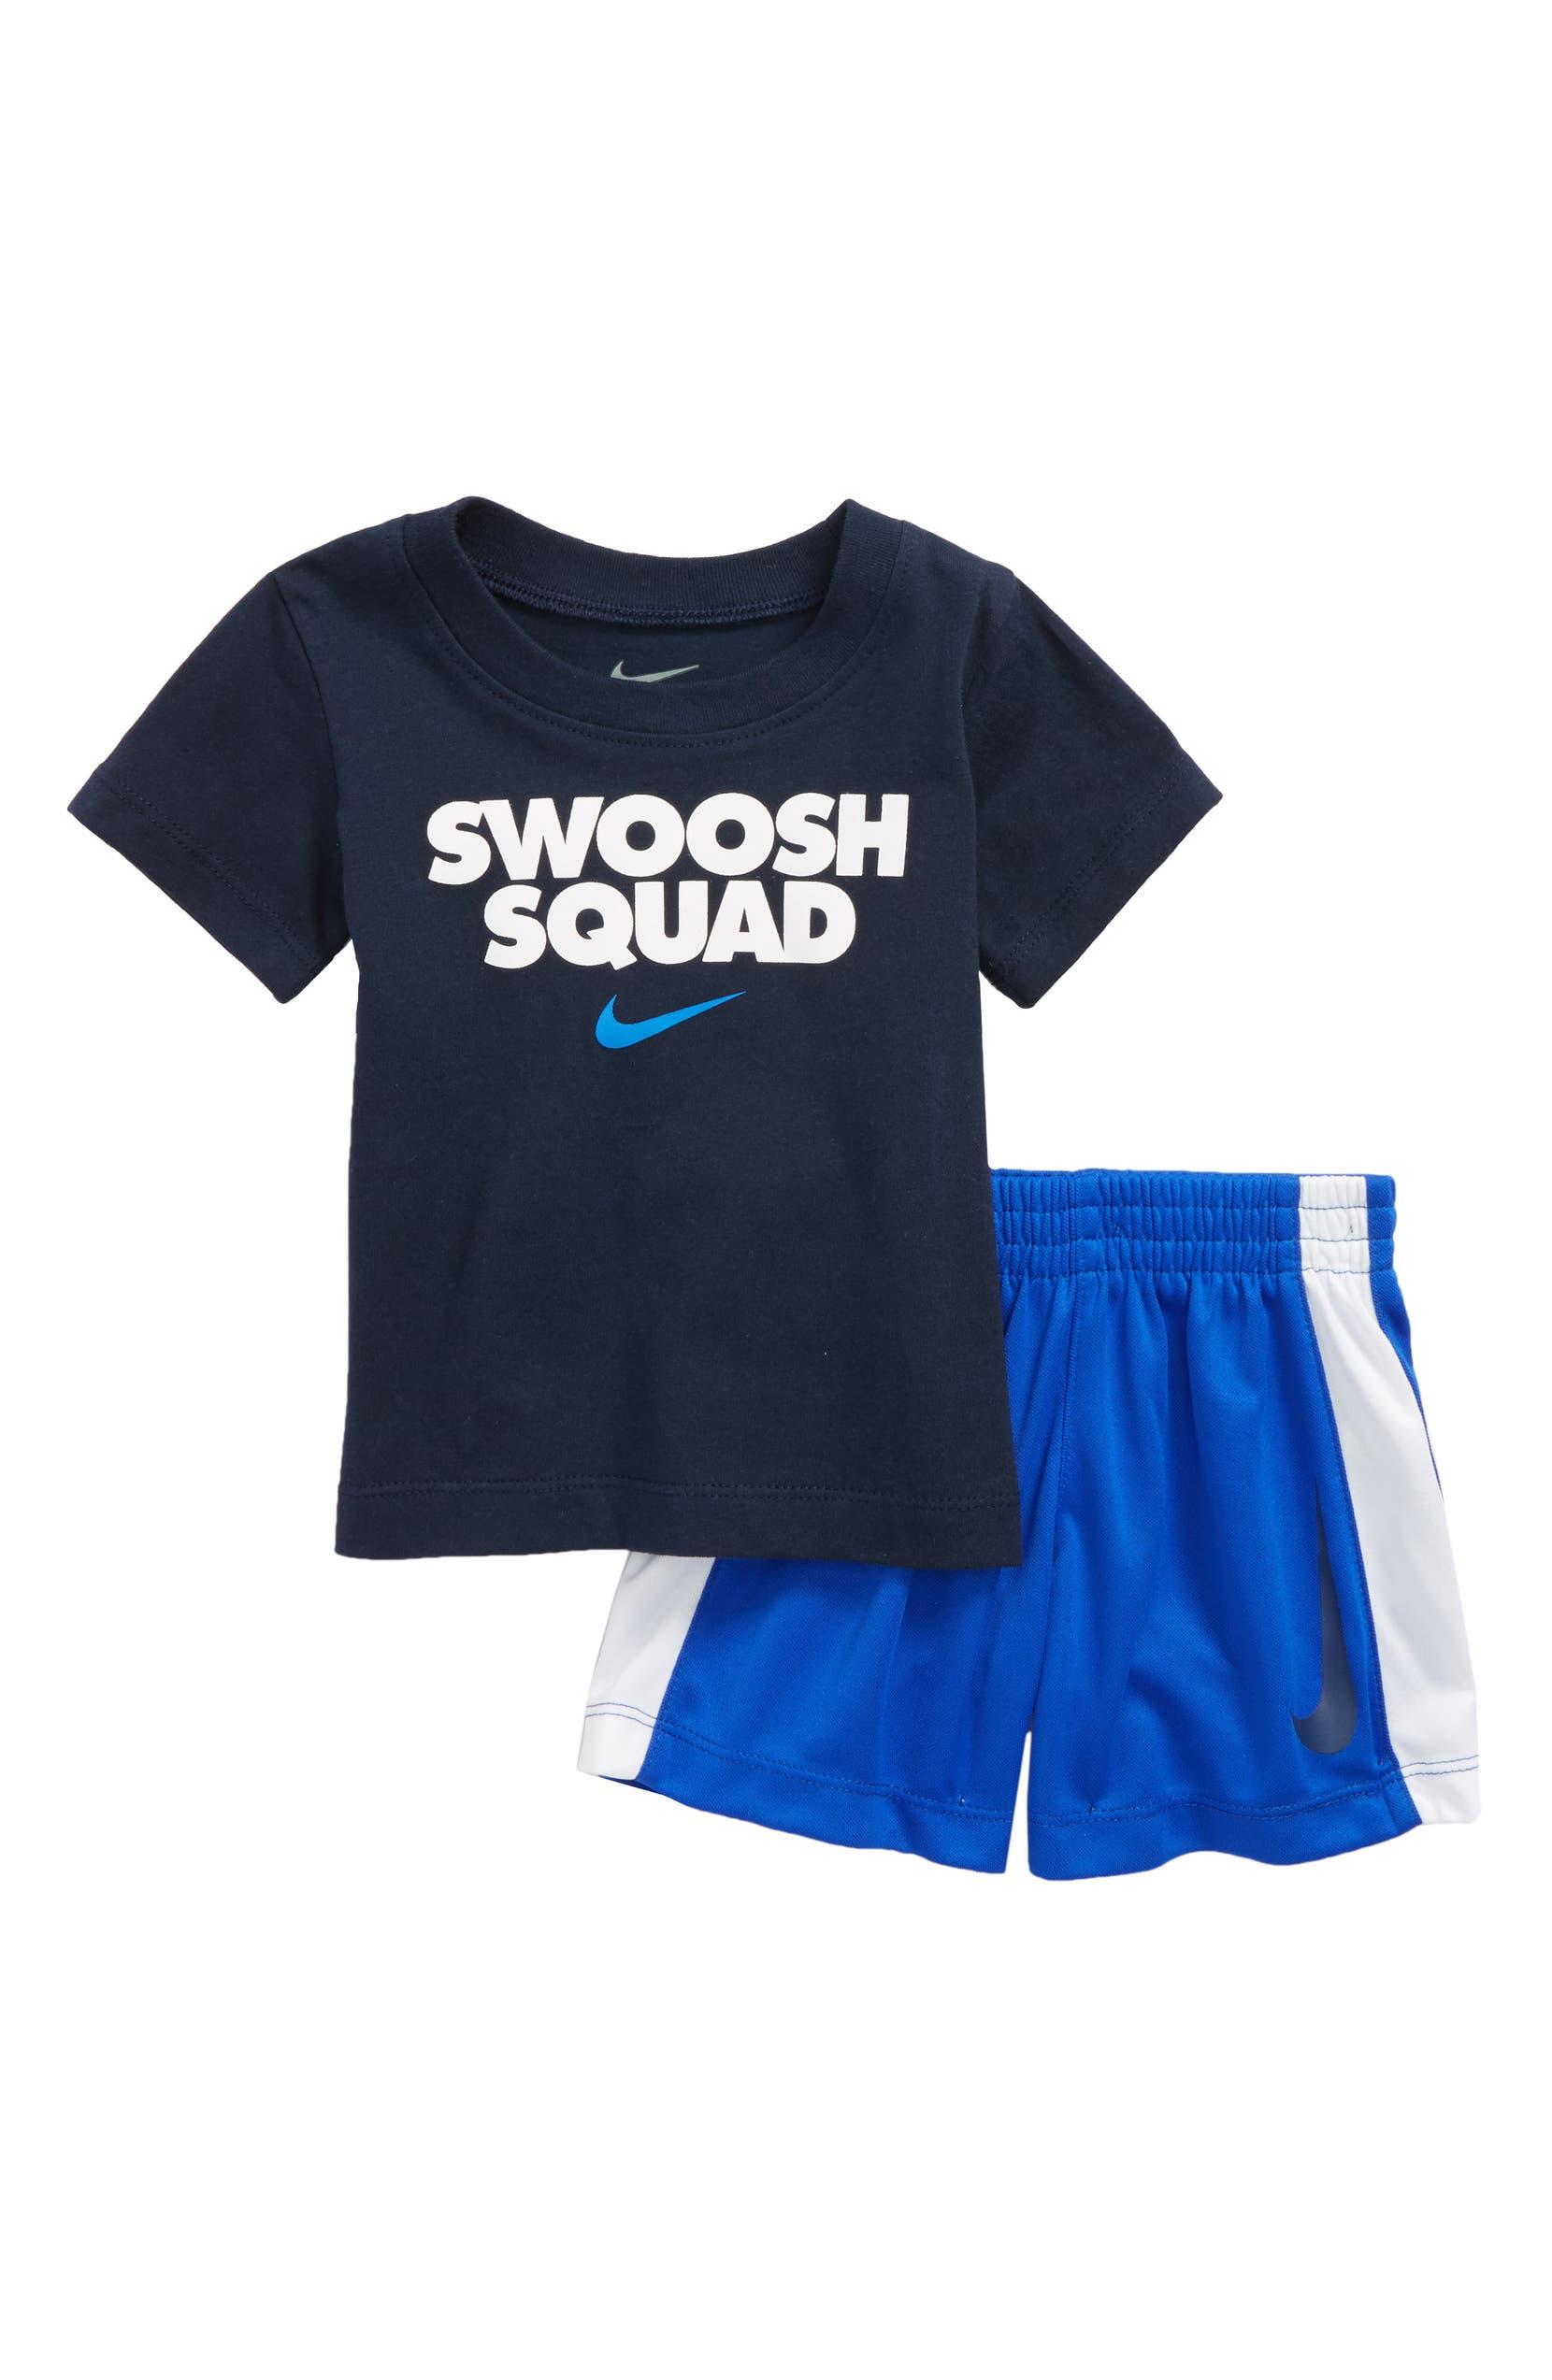 Nike Swoosh Squad T-Shirt   Shorts Set (Baby Boys)  0f3fea726